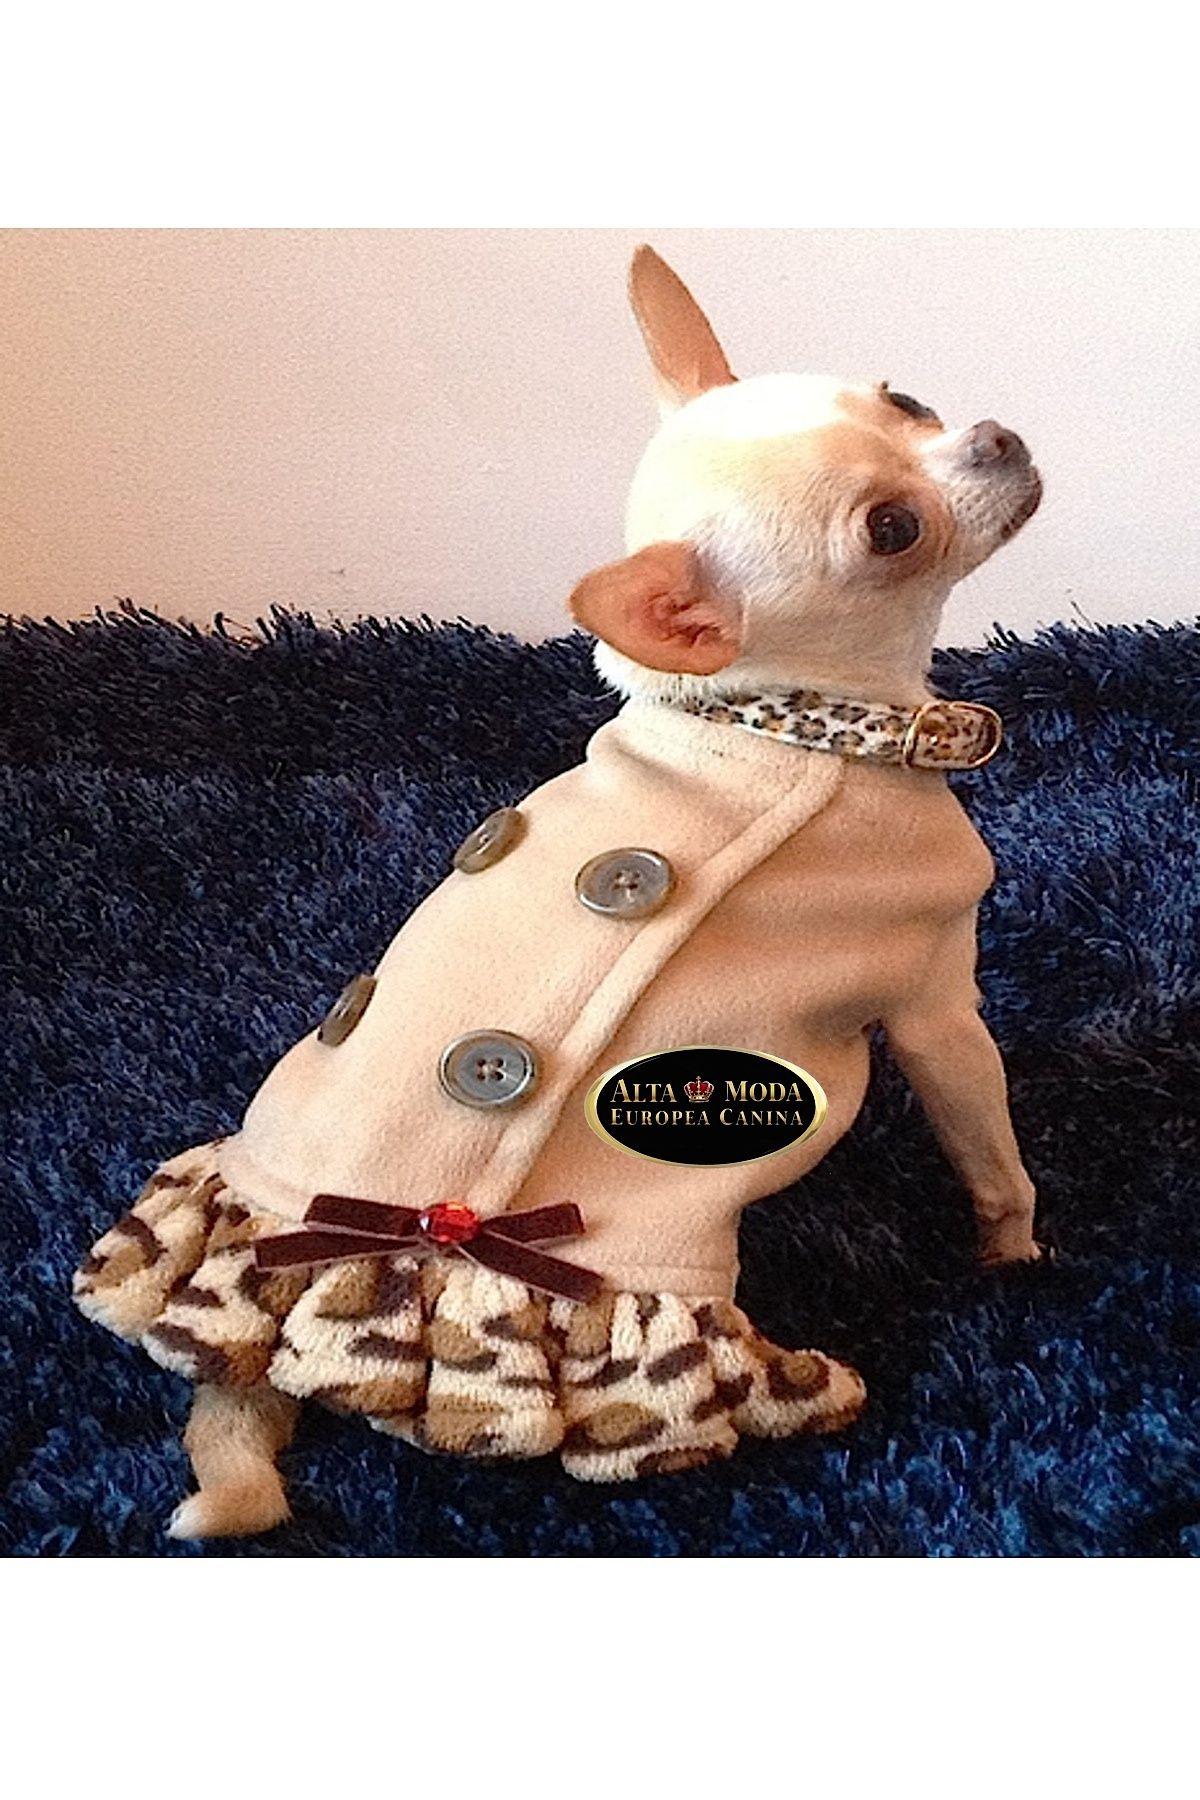 VESTIDO CHAQUETON LEOPARD BEIGE perritos Pinterest